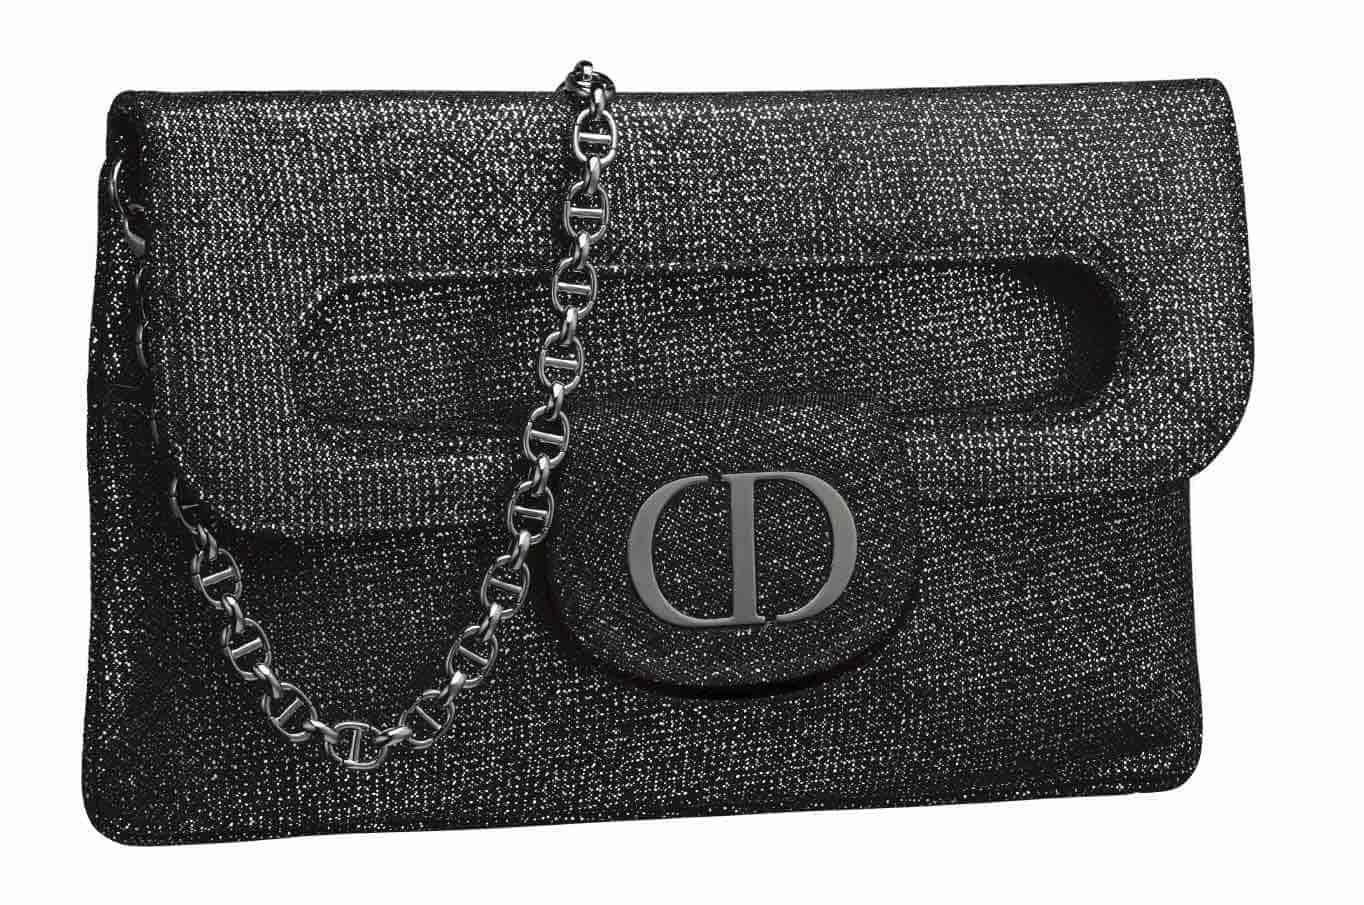 2021Dior包包保值推薦小黑包,30 Montaigne、Dior Caro....Jessica、蔡詩芸搶背同款Lady Dior-4